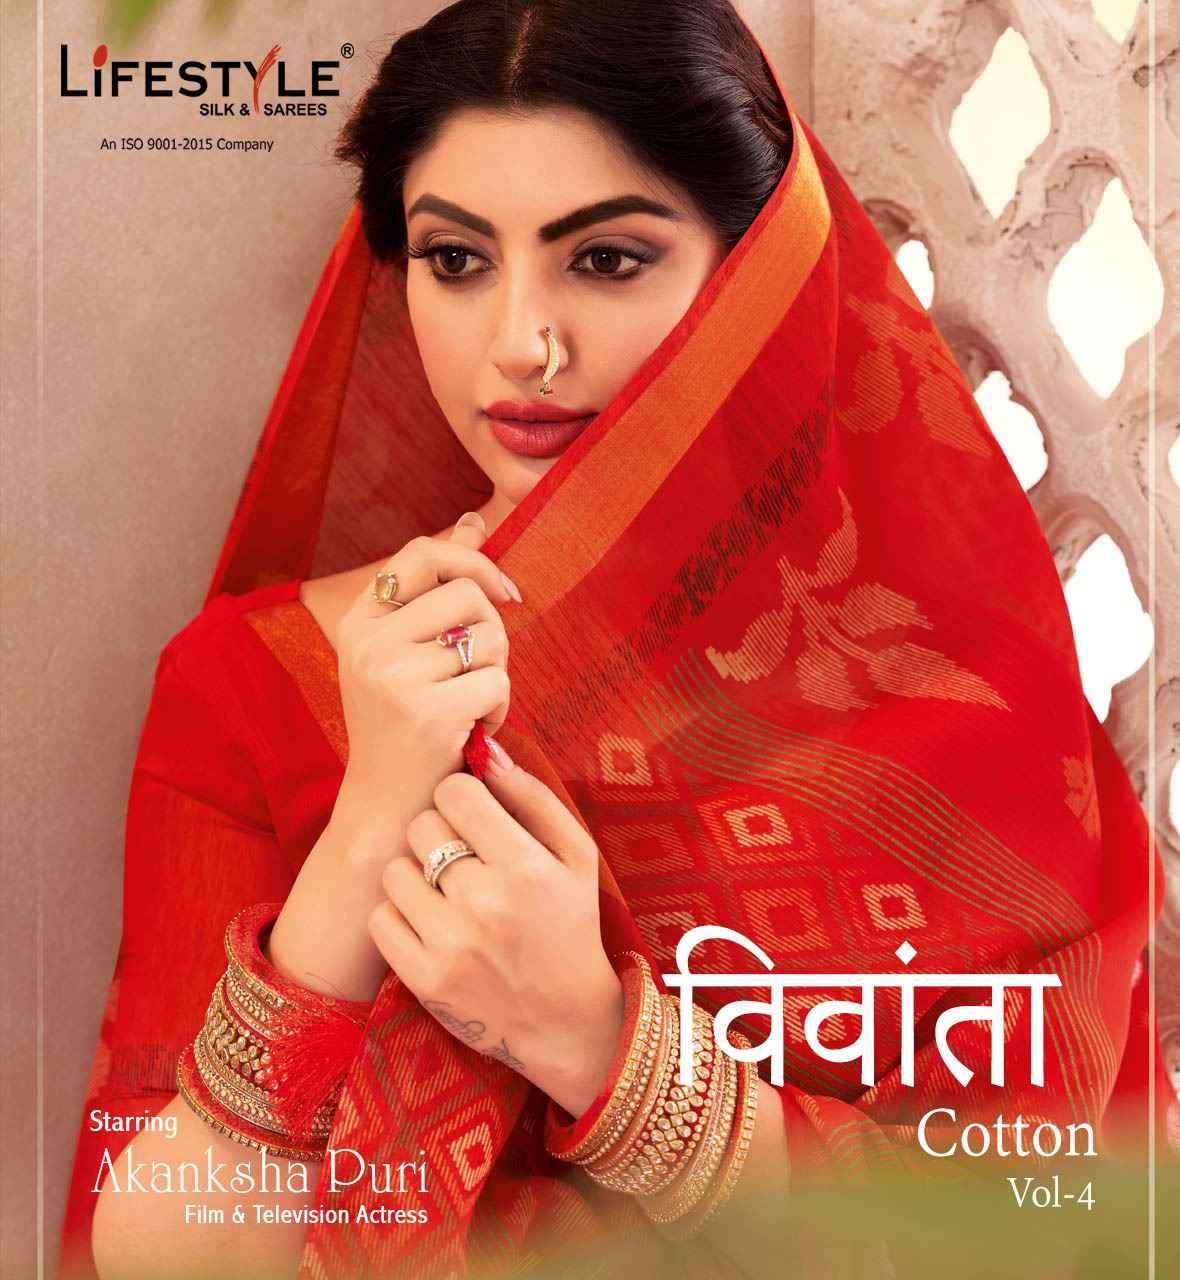 Lifestyle Vivanta Cotton Vol 4 Cotton Print Linen Saree Catalog Wholesaler